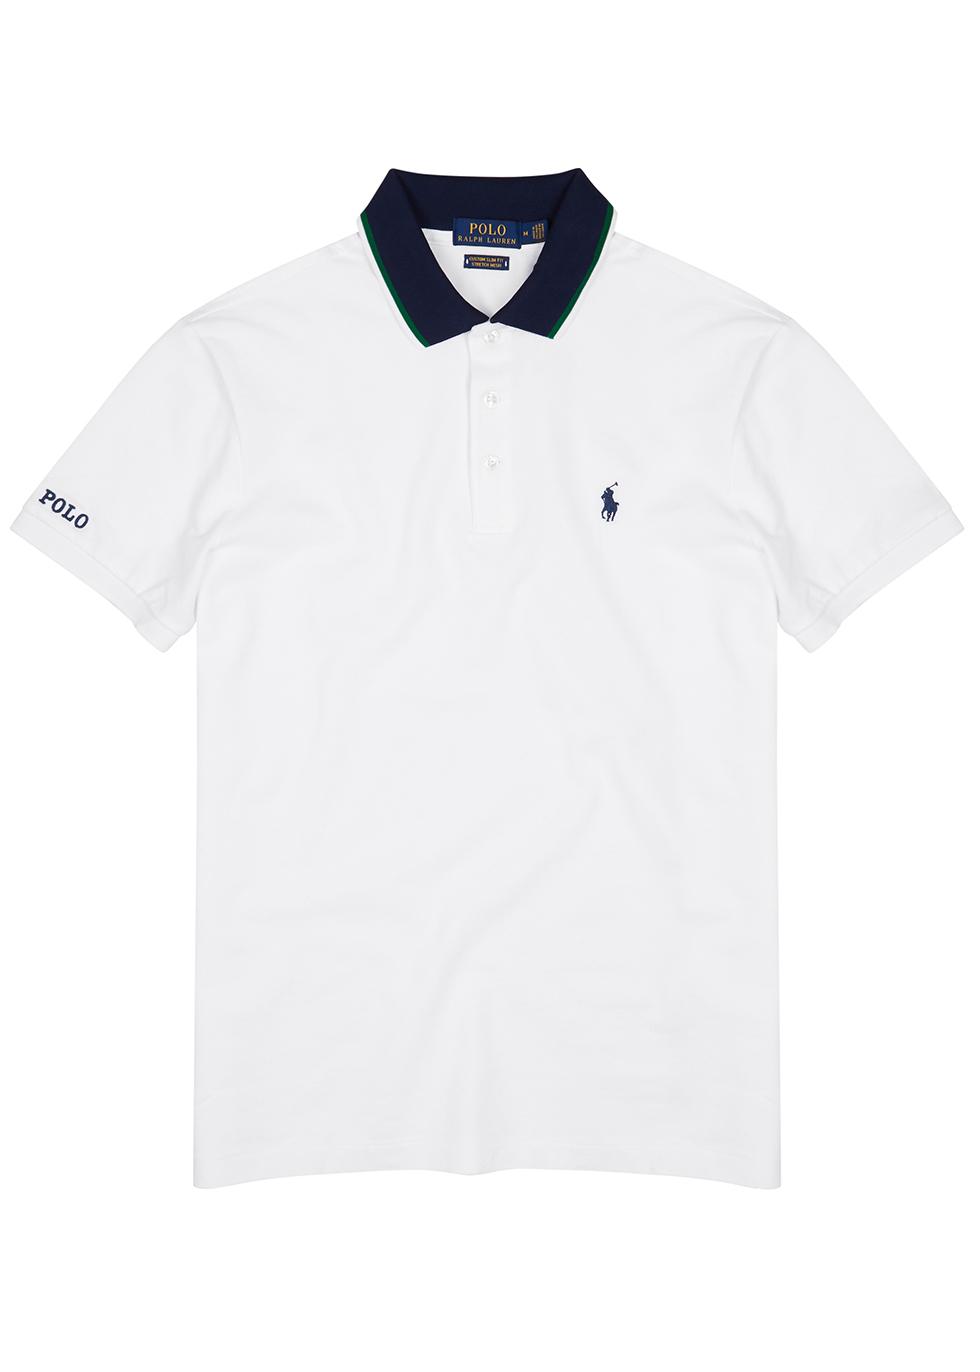 165ca3c7e Men's Designer Polo Shirts - Polo Shirts For Men - Harvey Nichols